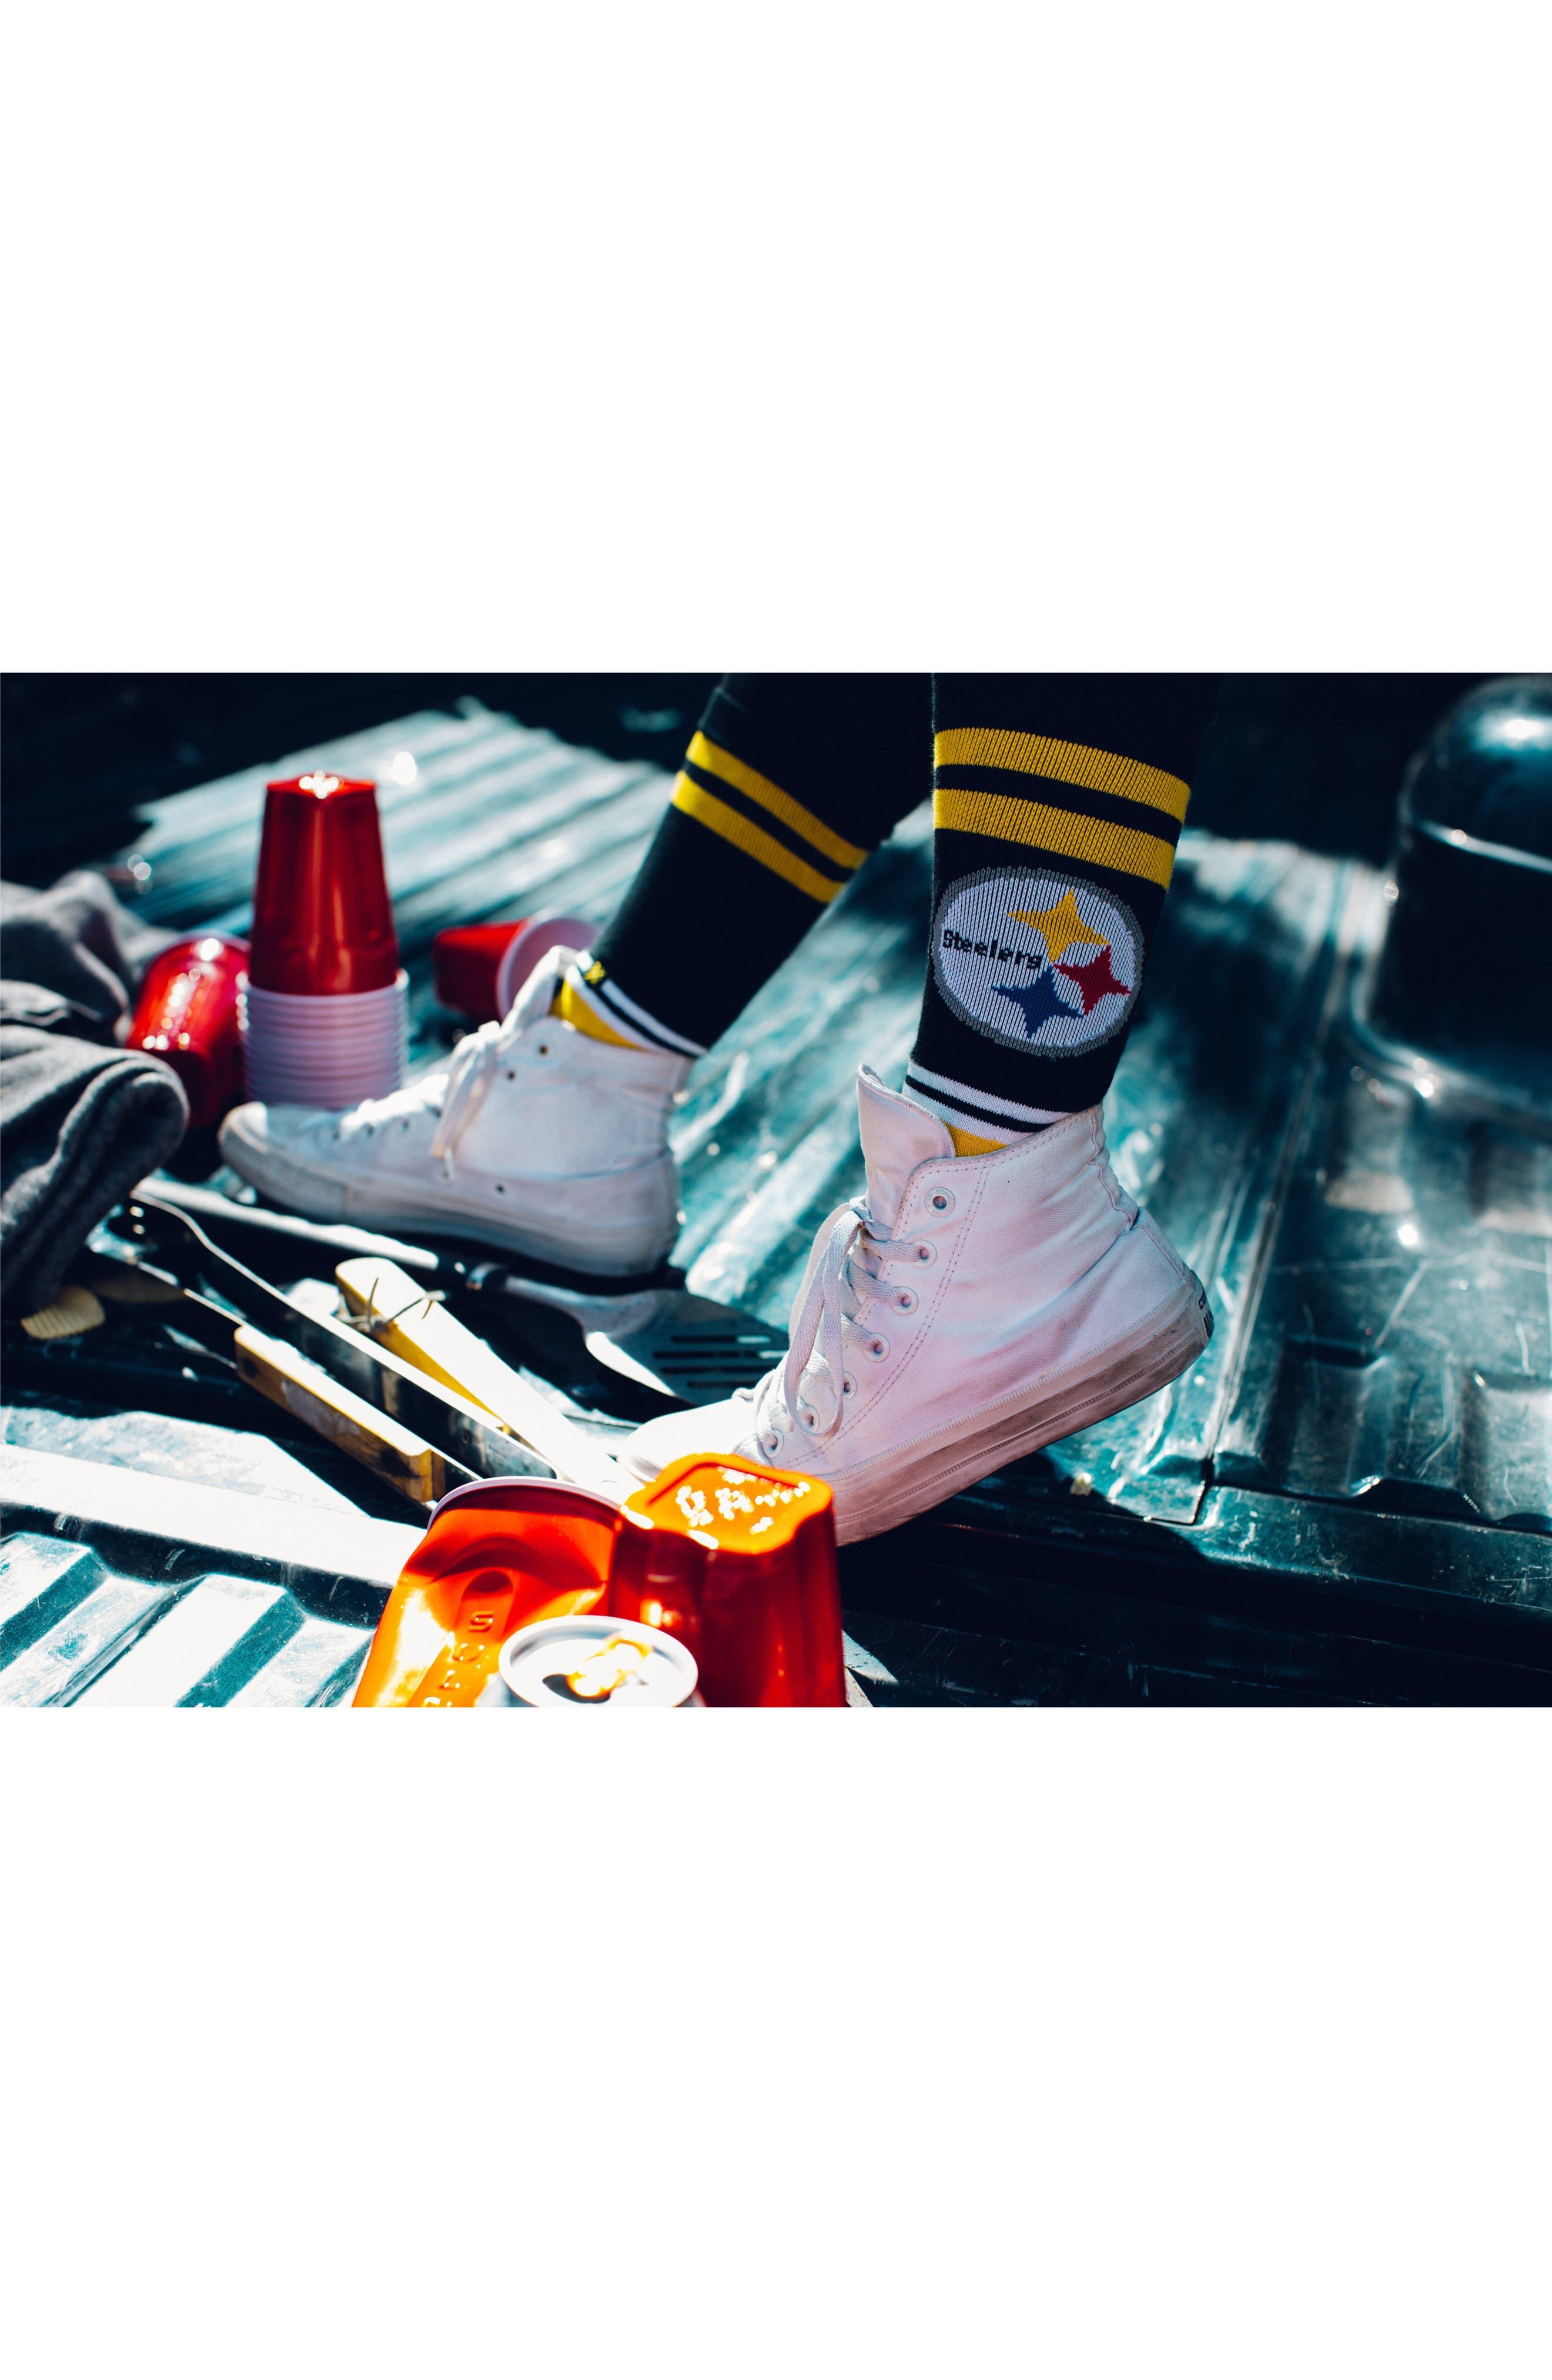 Pittsburgh Steelers - Fade Socks,                             Alternate thumbnail 6, color,                             700